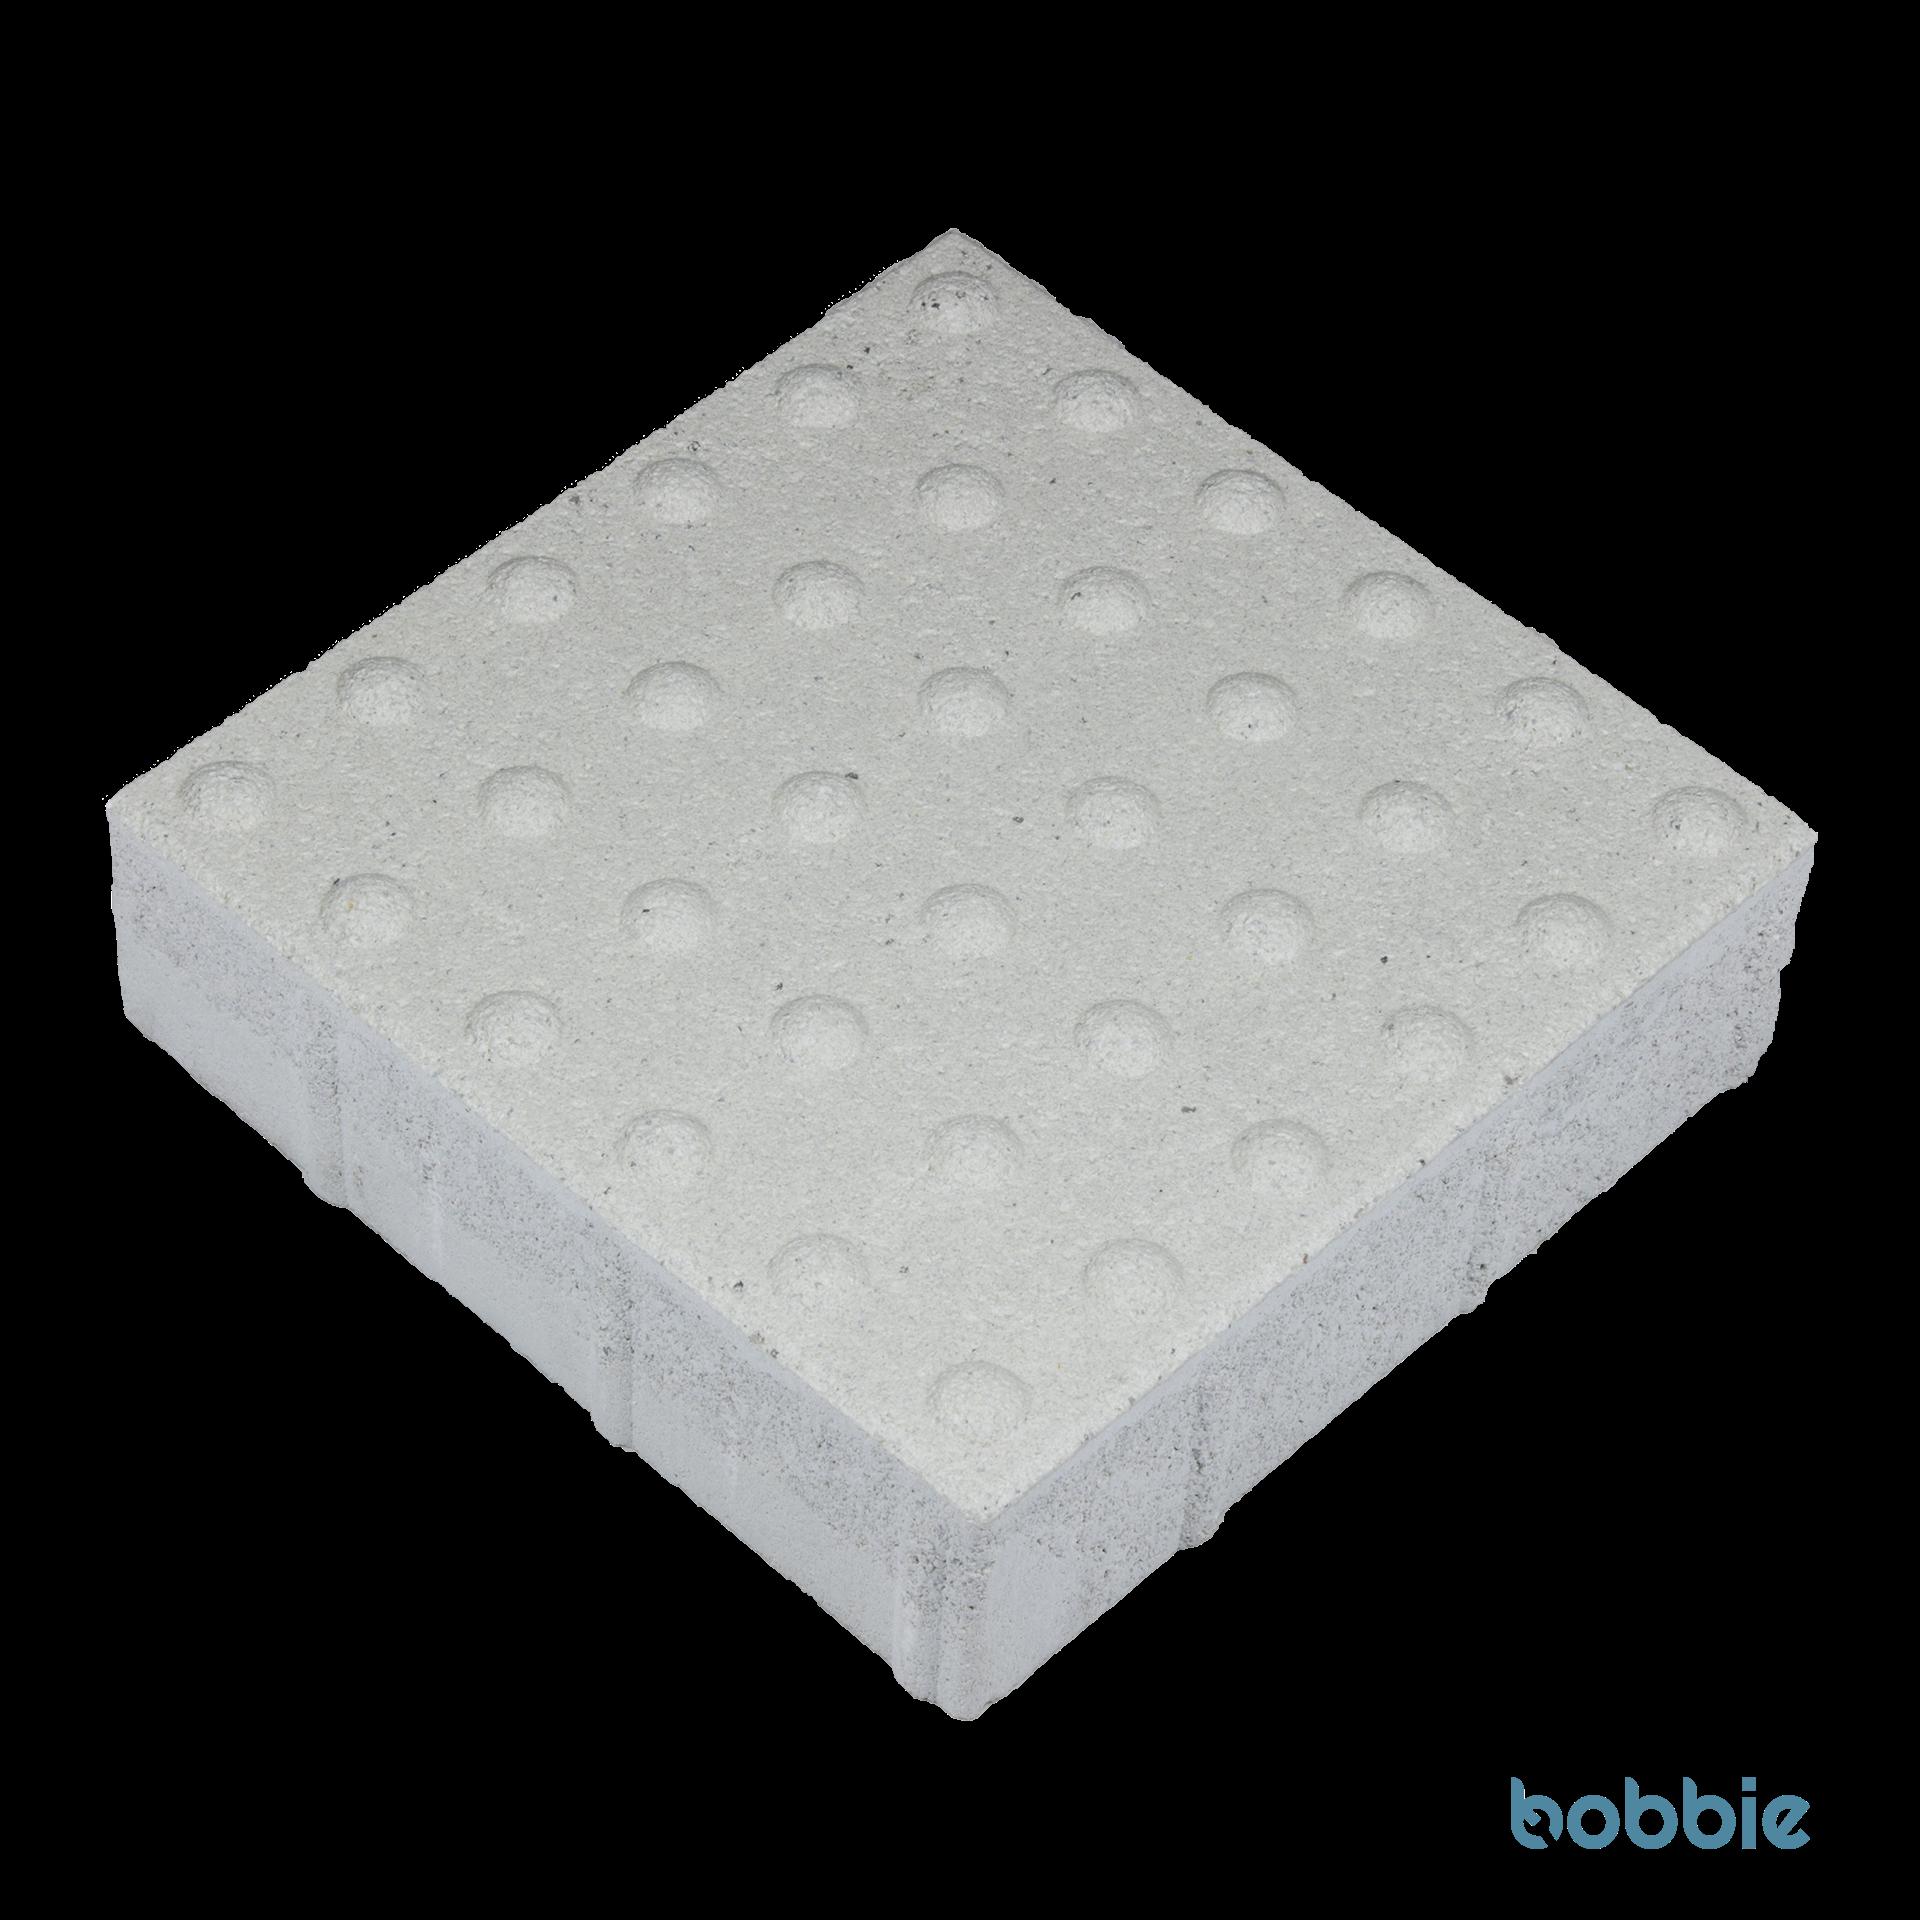 EASYCROSS DTE700 Weiß Noppenplatte 300 x 300 x 80 mm Kugelkalotte orthogonal